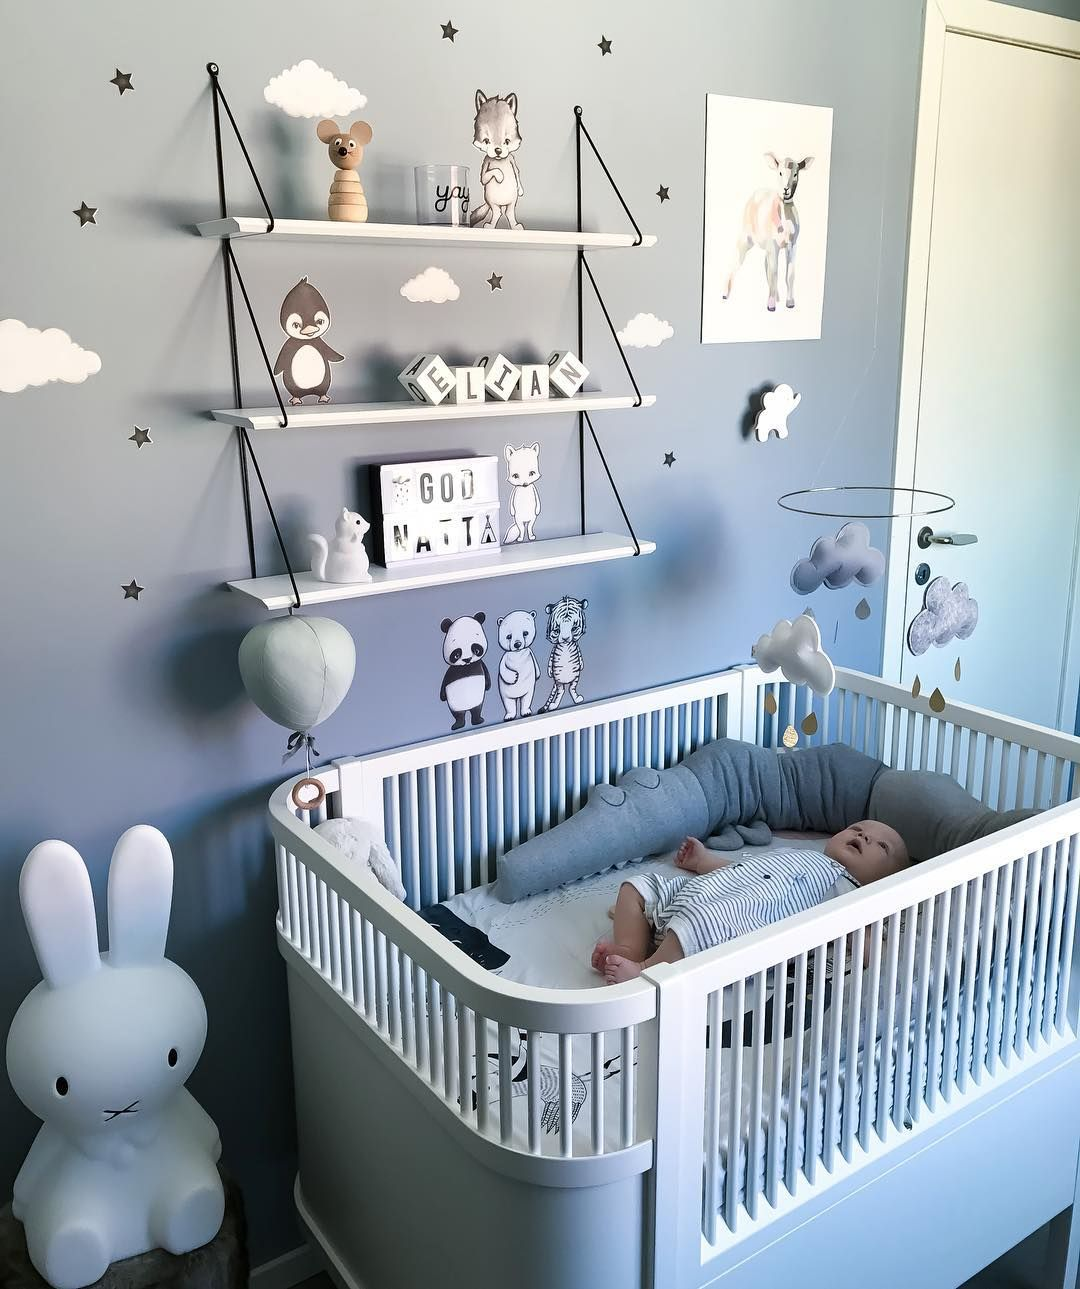 Really Cool Modern Baby Boy Room Idea This Baby Crib Looks Nice